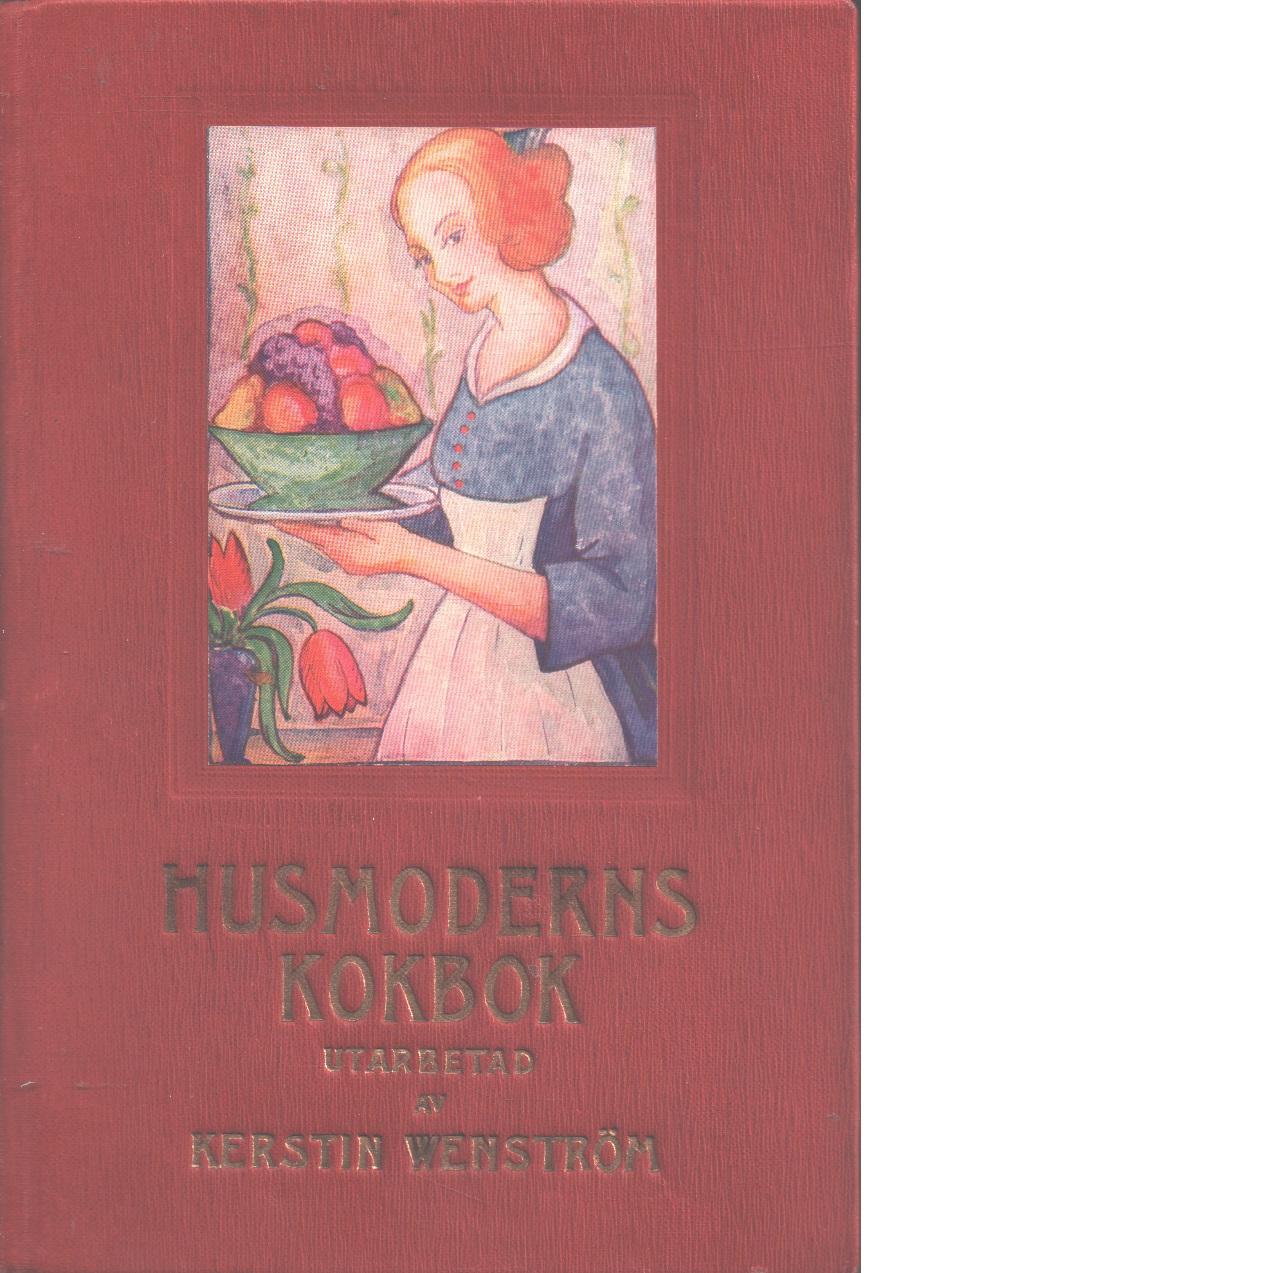 Husmoderns kokbok : det borgerliga hemmets kokbok - Wenström, Kerstin